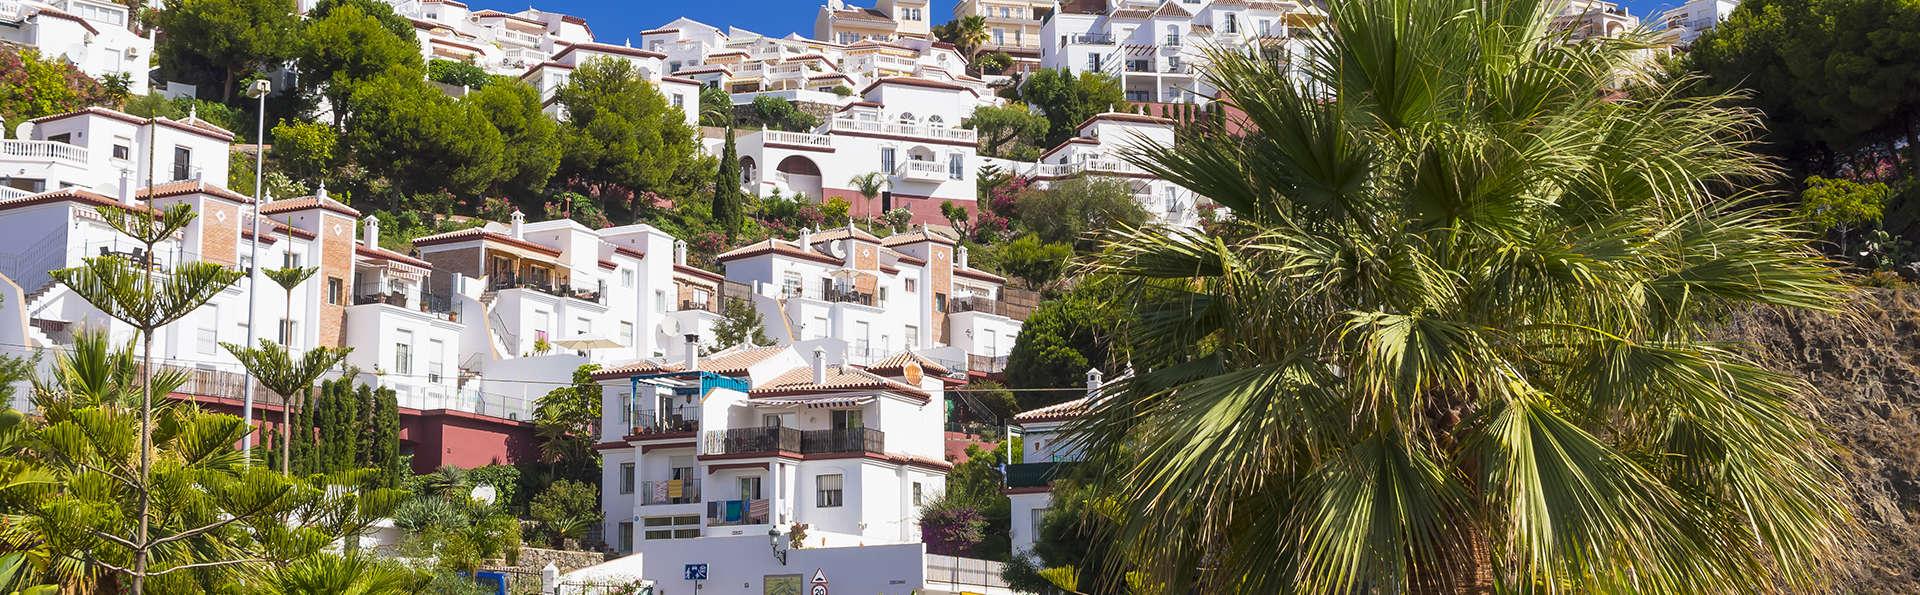 Hotel Soho Bahía Málaga - Edit_Malaga3.jpg